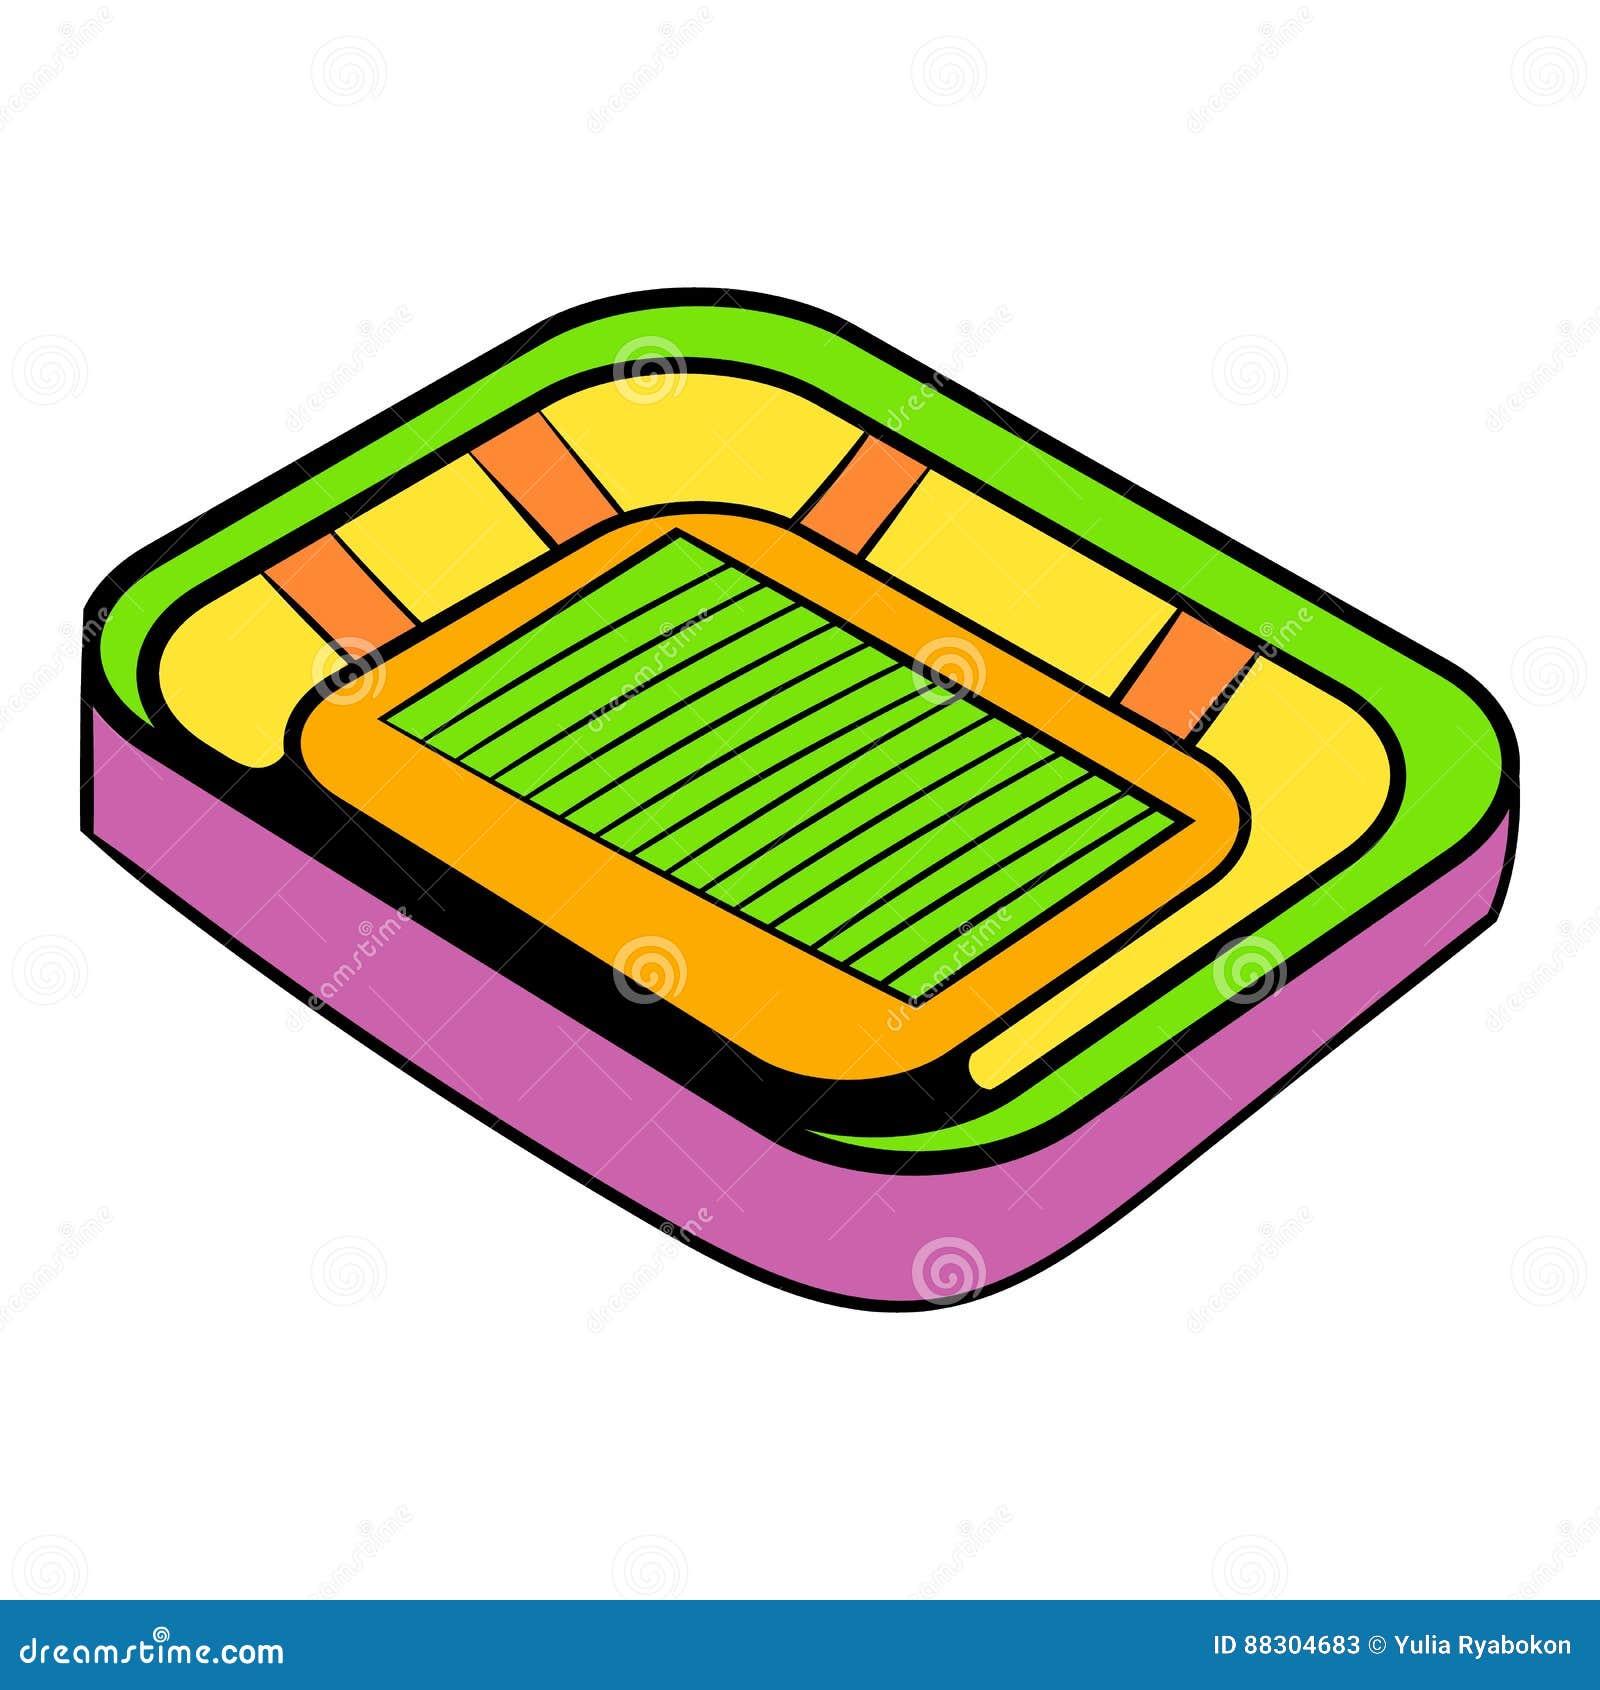 cartoon football stadium stock illustrations 4 876 cartoon football stadium stock illustrations vectors clipart dreamstime dreamstime com